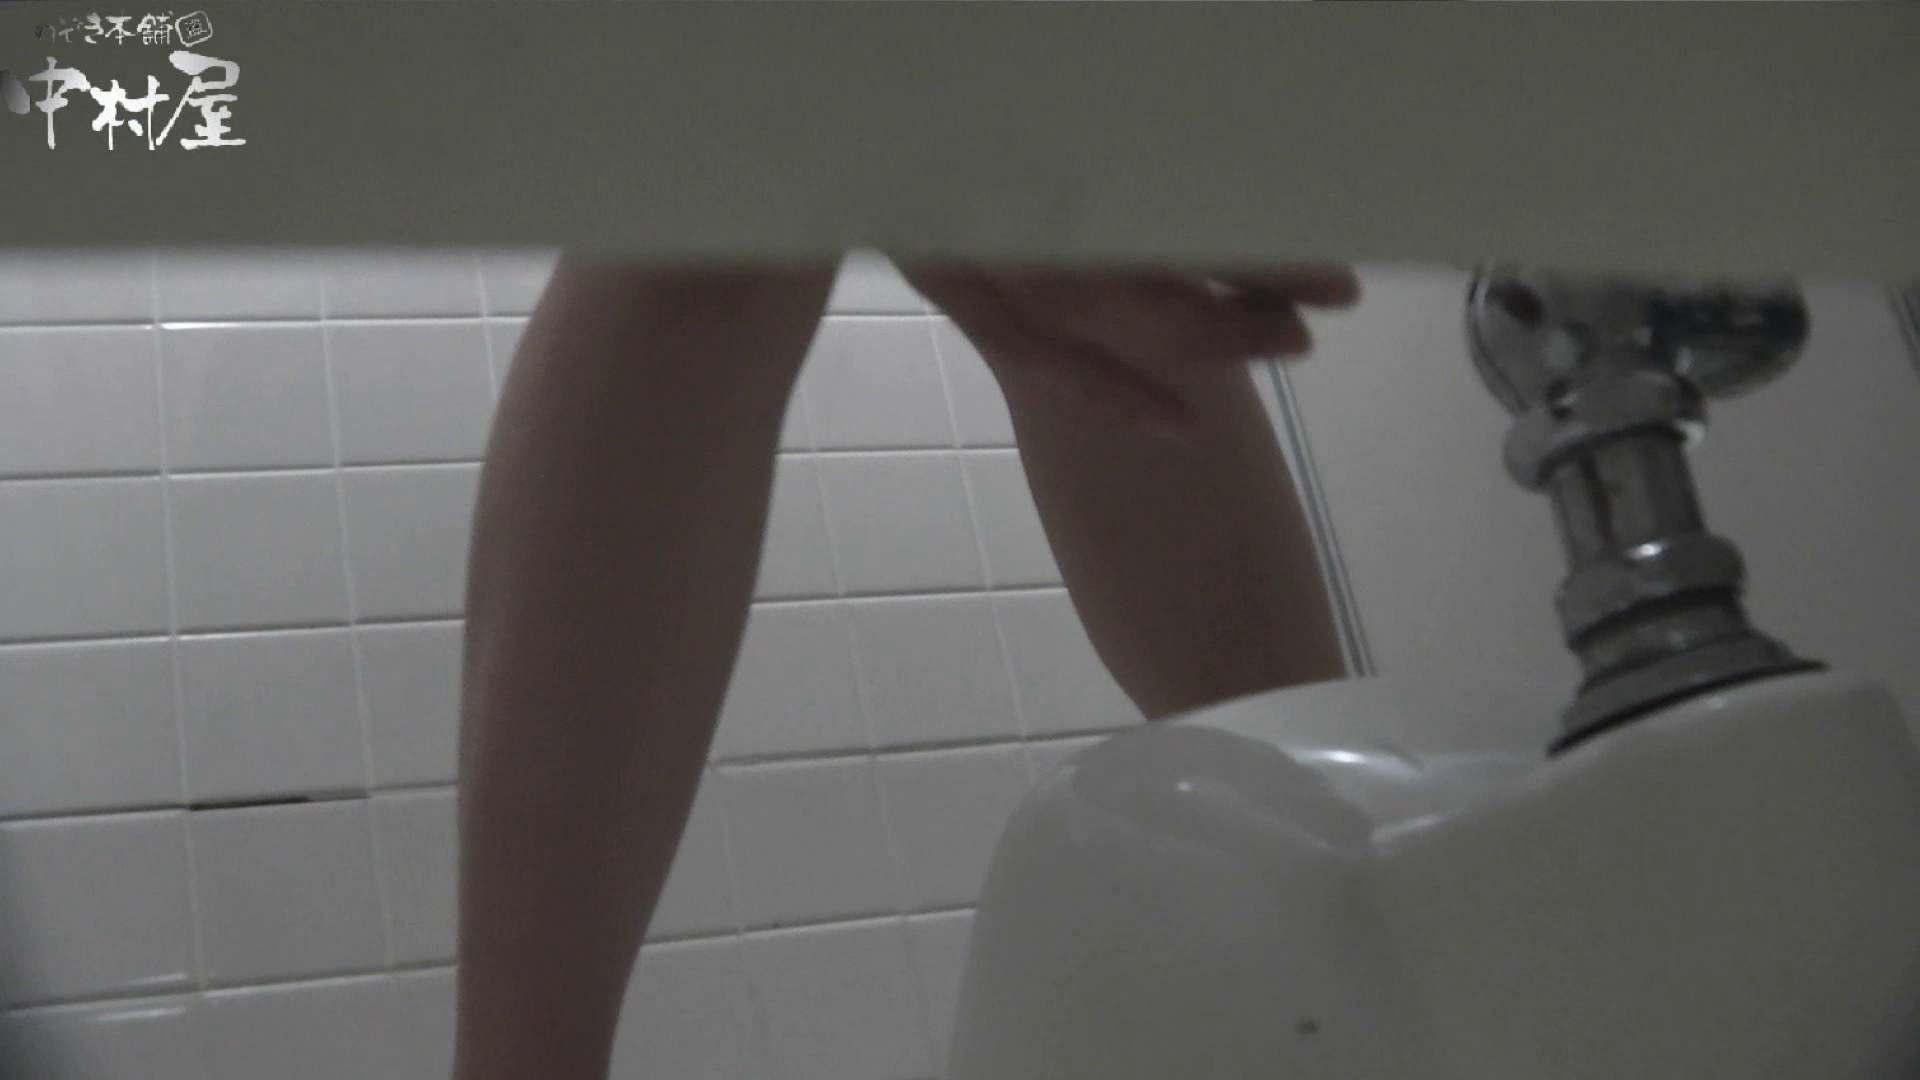 vol.34 命がけ潜伏洗面所! アソコの毛が長髪な件 プライベート AV無料動画キャプチャ 72連発 71